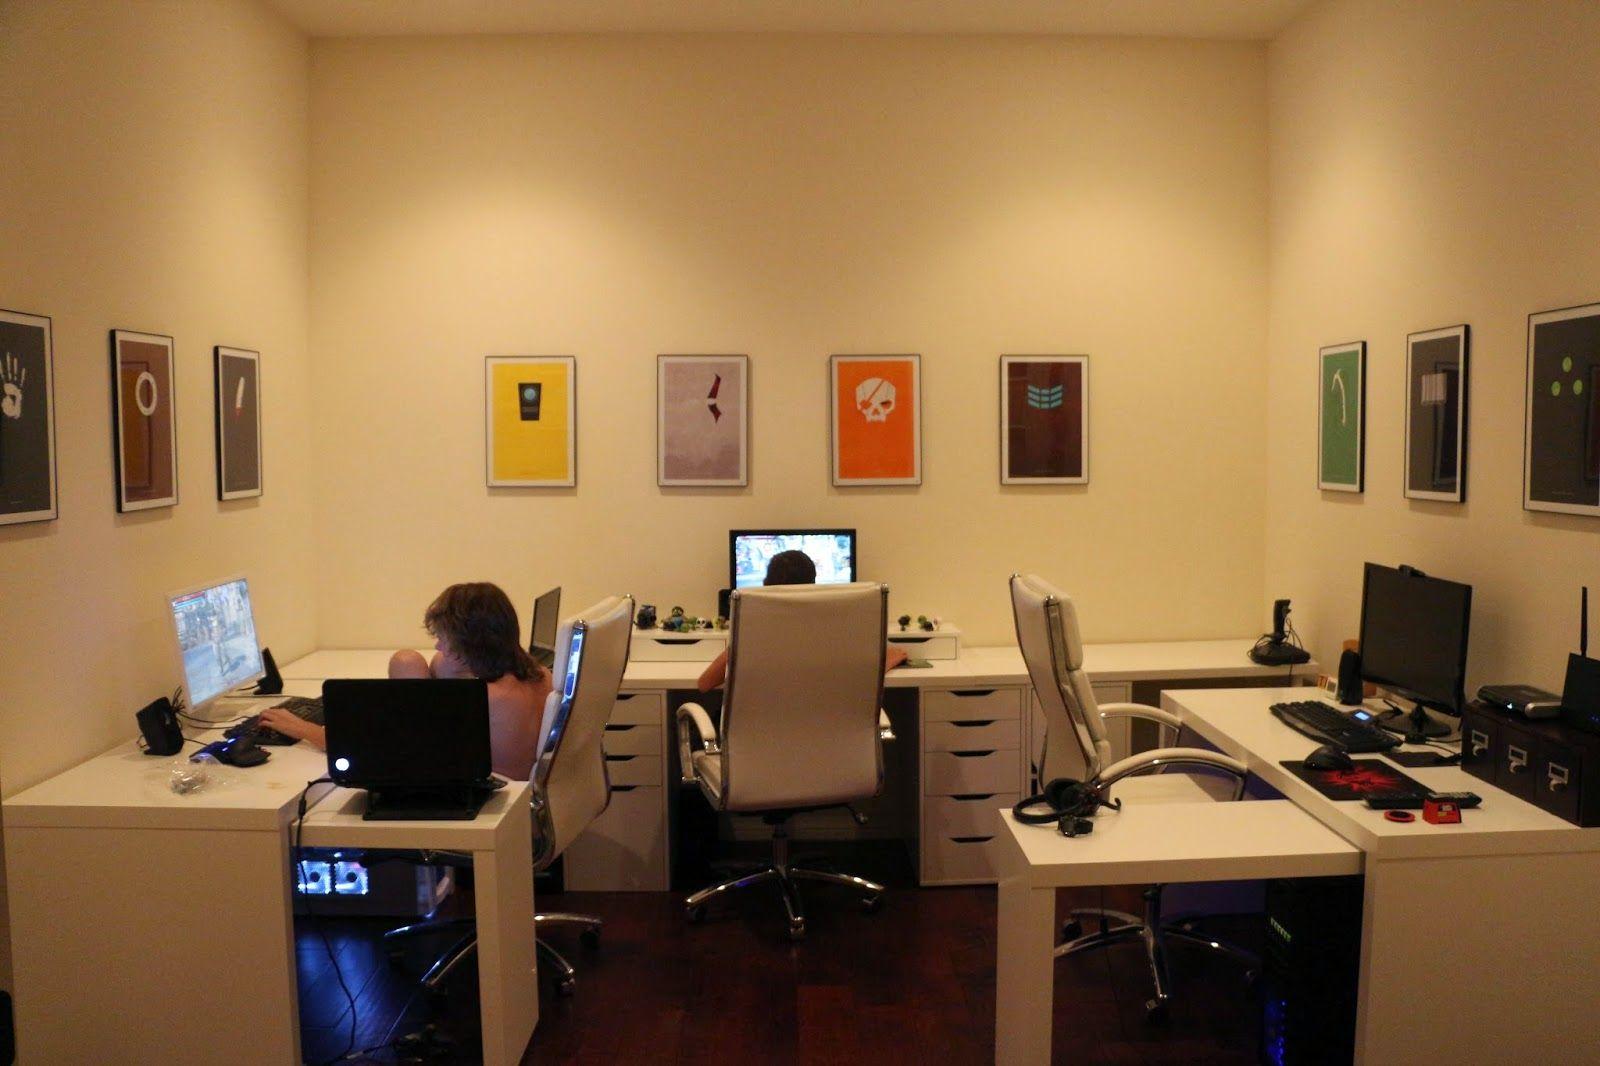 Dusty Coyote Hanging Pictures Tile Tech Room Geek Room Gamer Room Diy